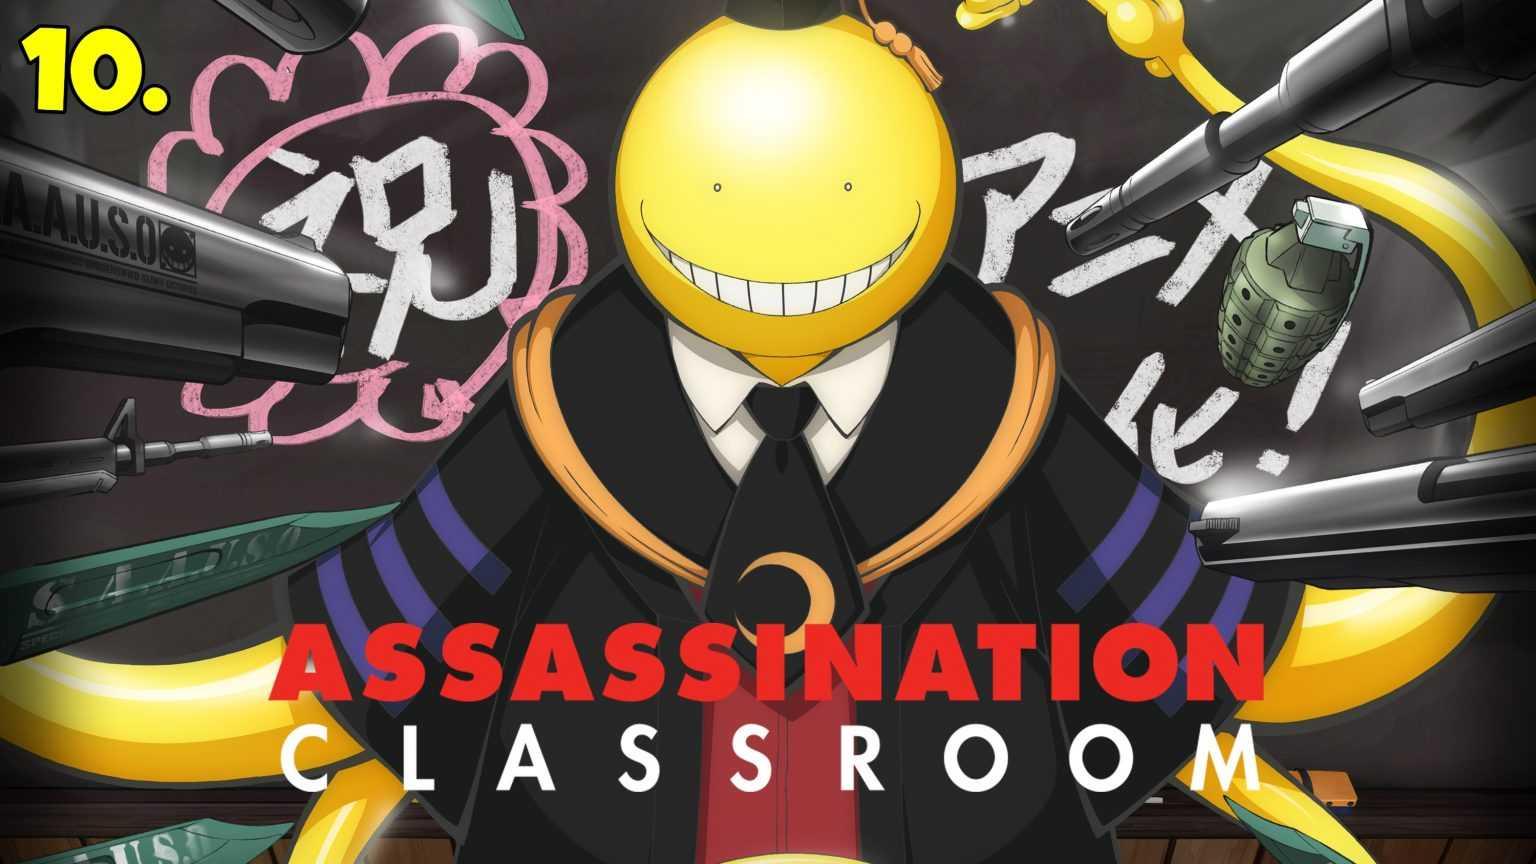 Assassination-Classroom